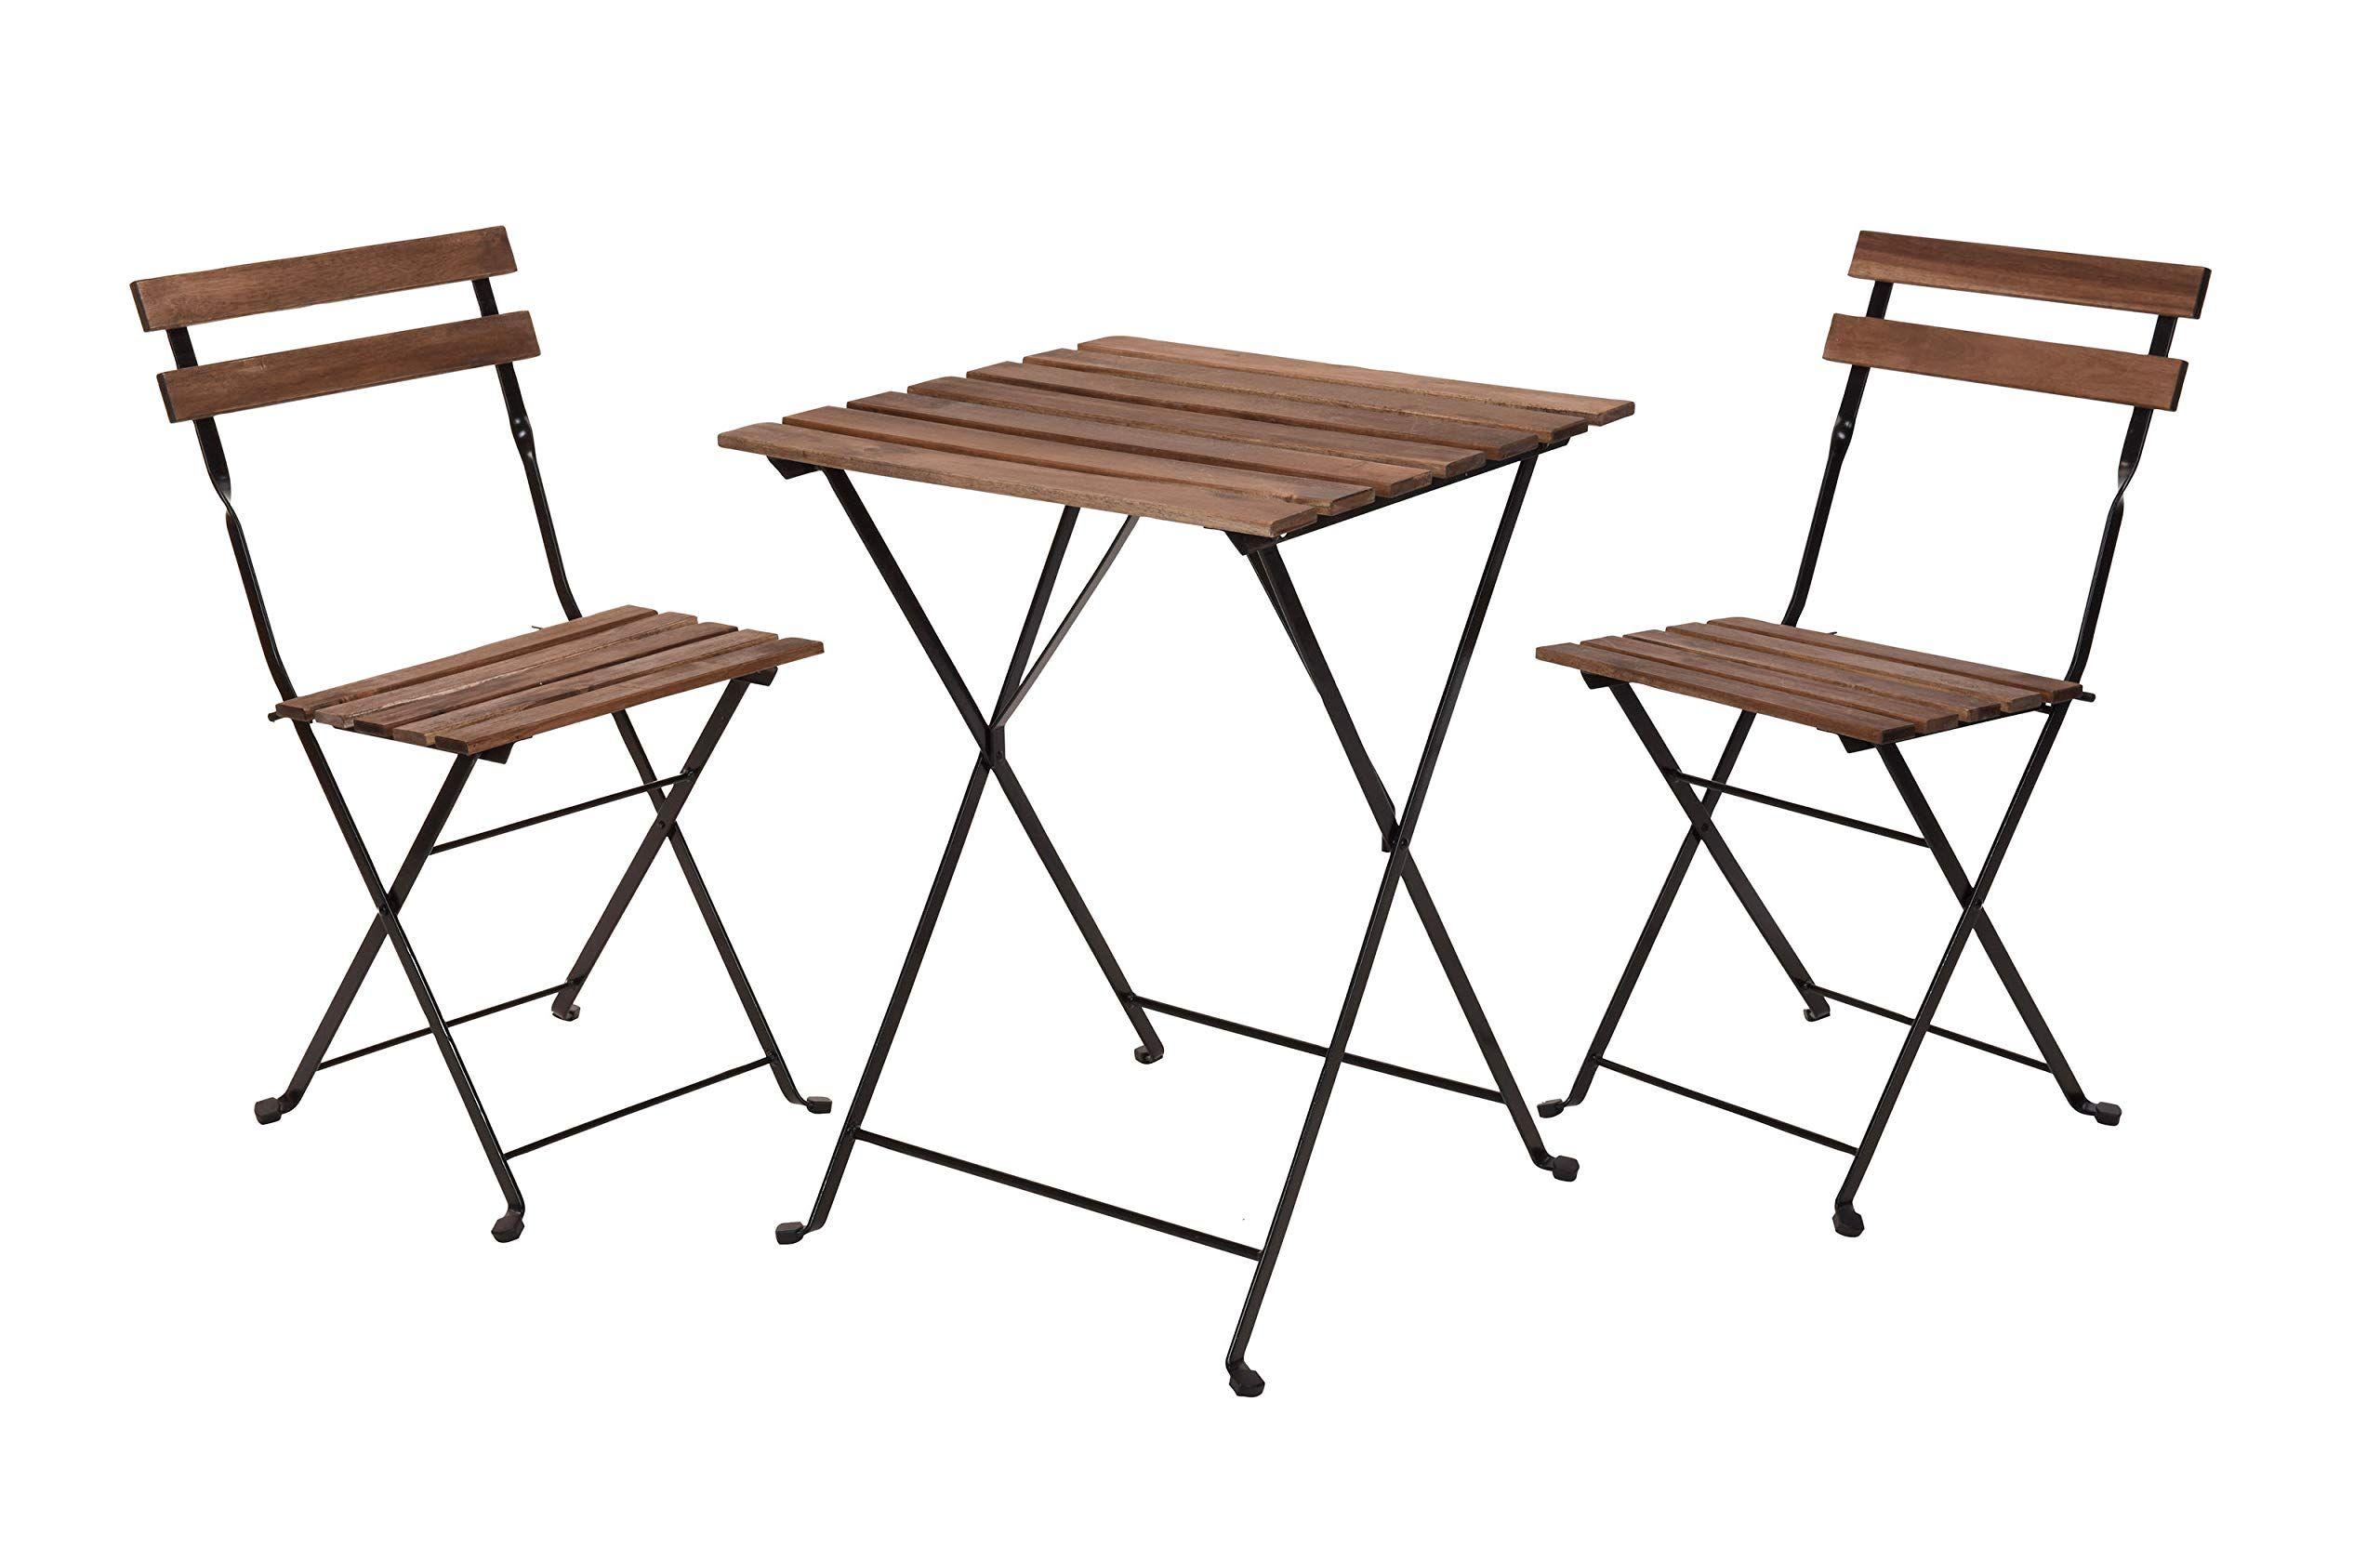 Amazon De Holz Bistroset 2 Metall Stuhle Und Bistrotisch Sitzgruppe Balkonmobel Balkon Set Klappstuhl Klapptisch Bistrotisch Klapptisch Balkonmobel